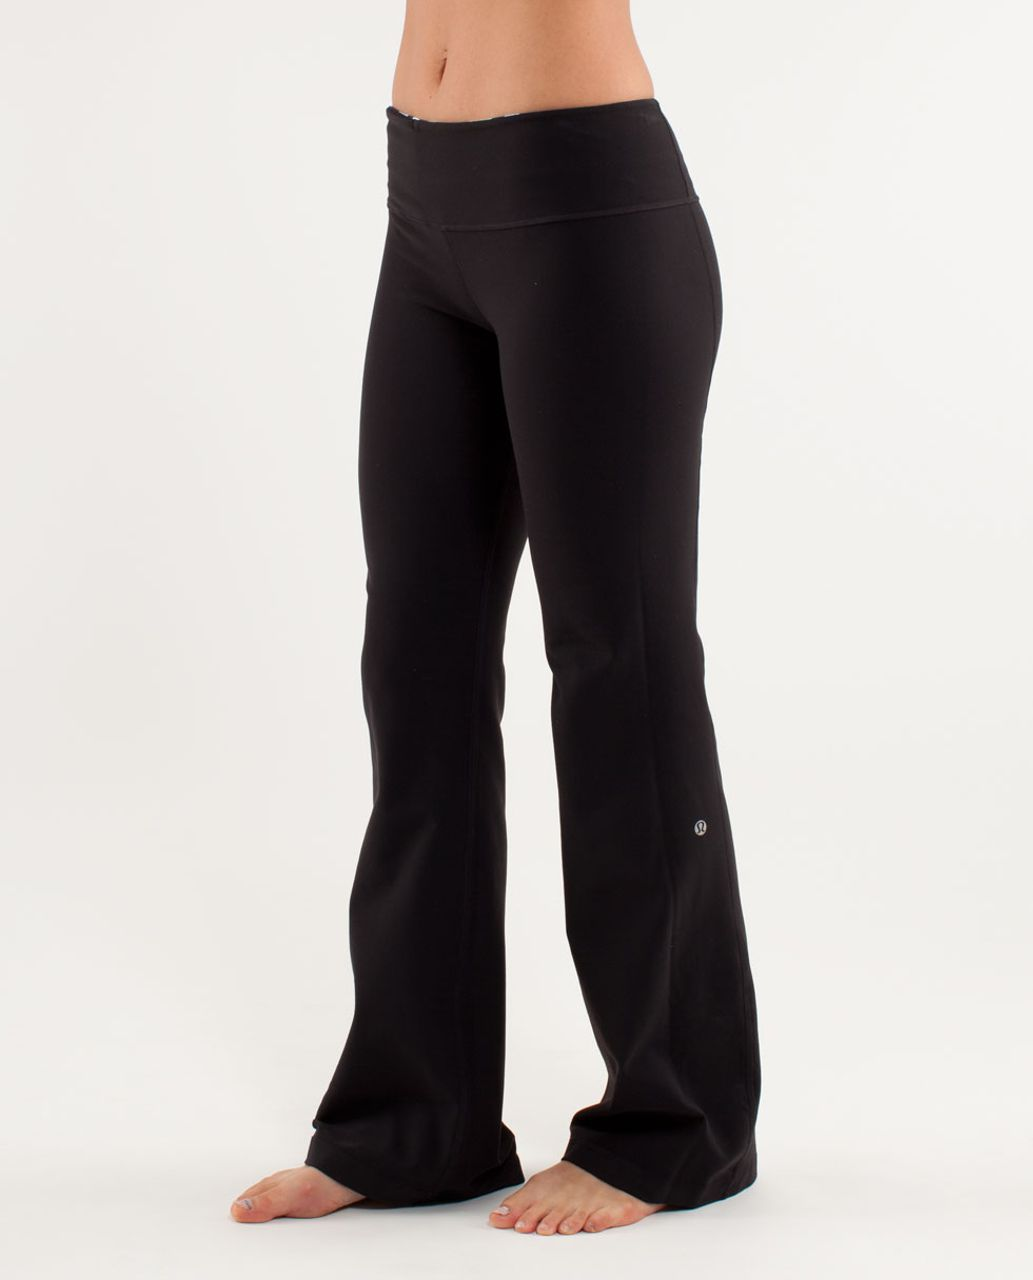 Lululemon Groove Pant (Regular) - Black /  Discover Stripe White Deep Indigo /  Heathered Aquamarine